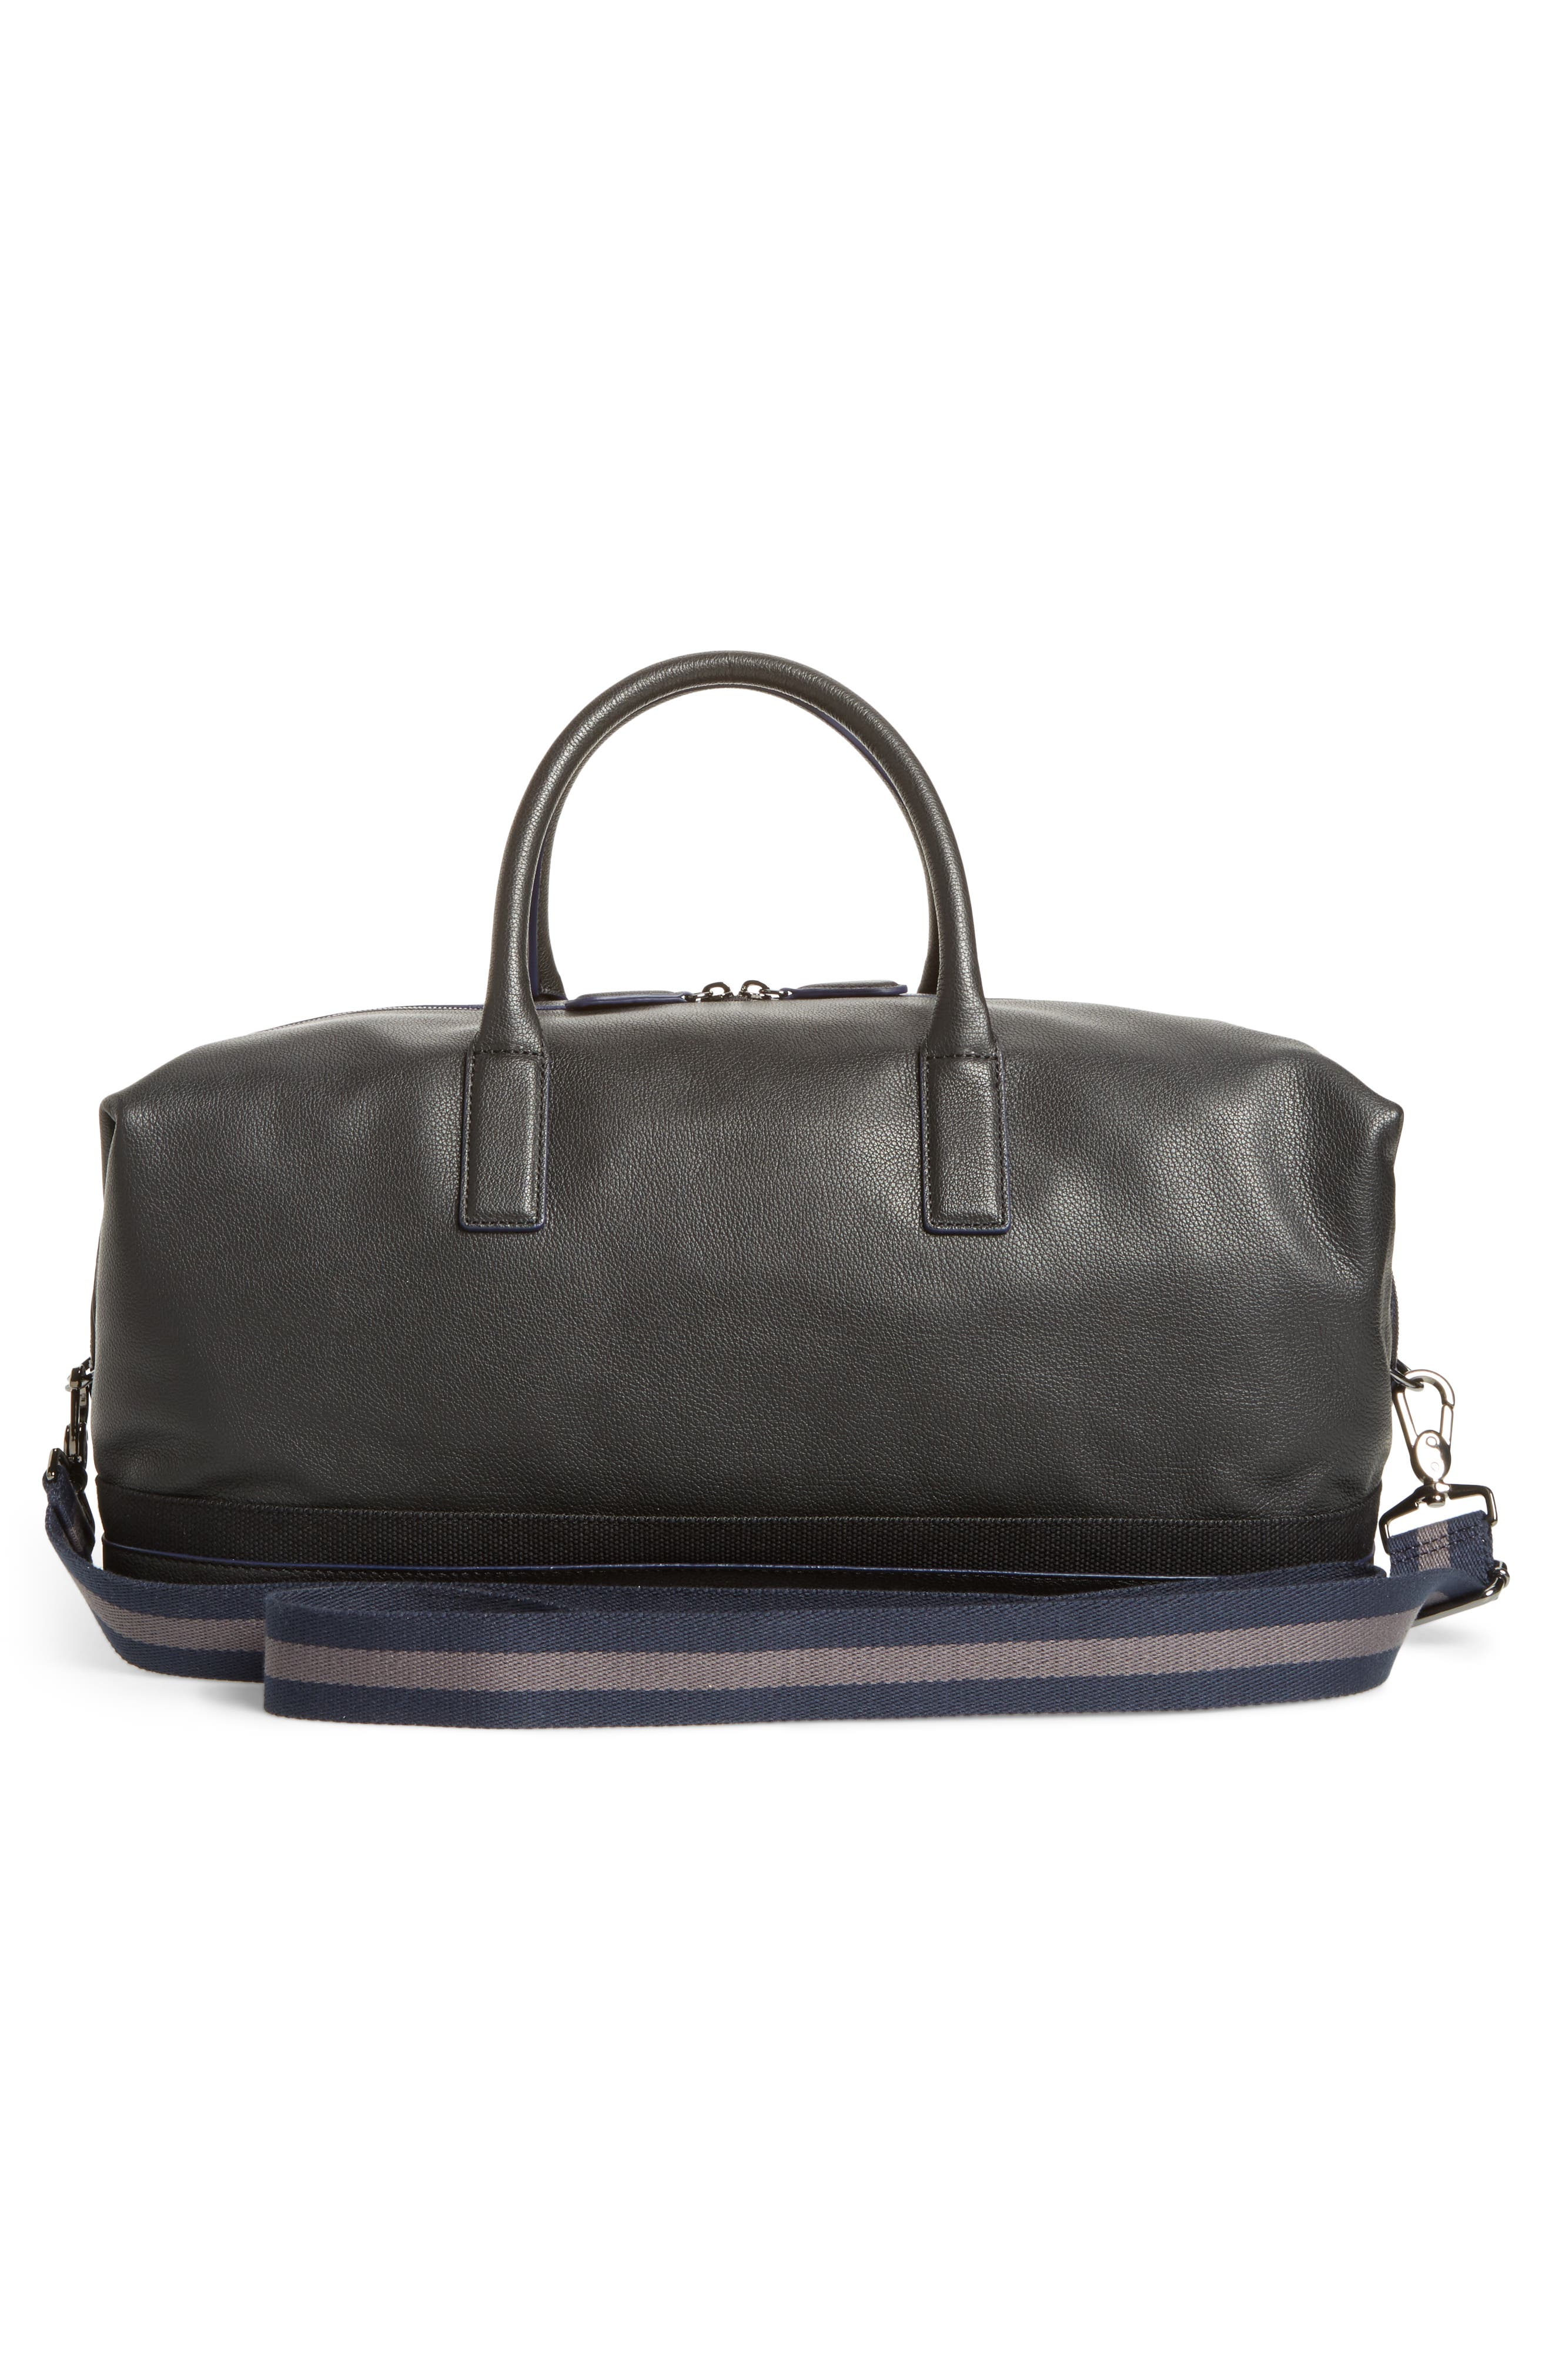 Mylow Duffel Bag,                             Alternate thumbnail 3, color,                             Black